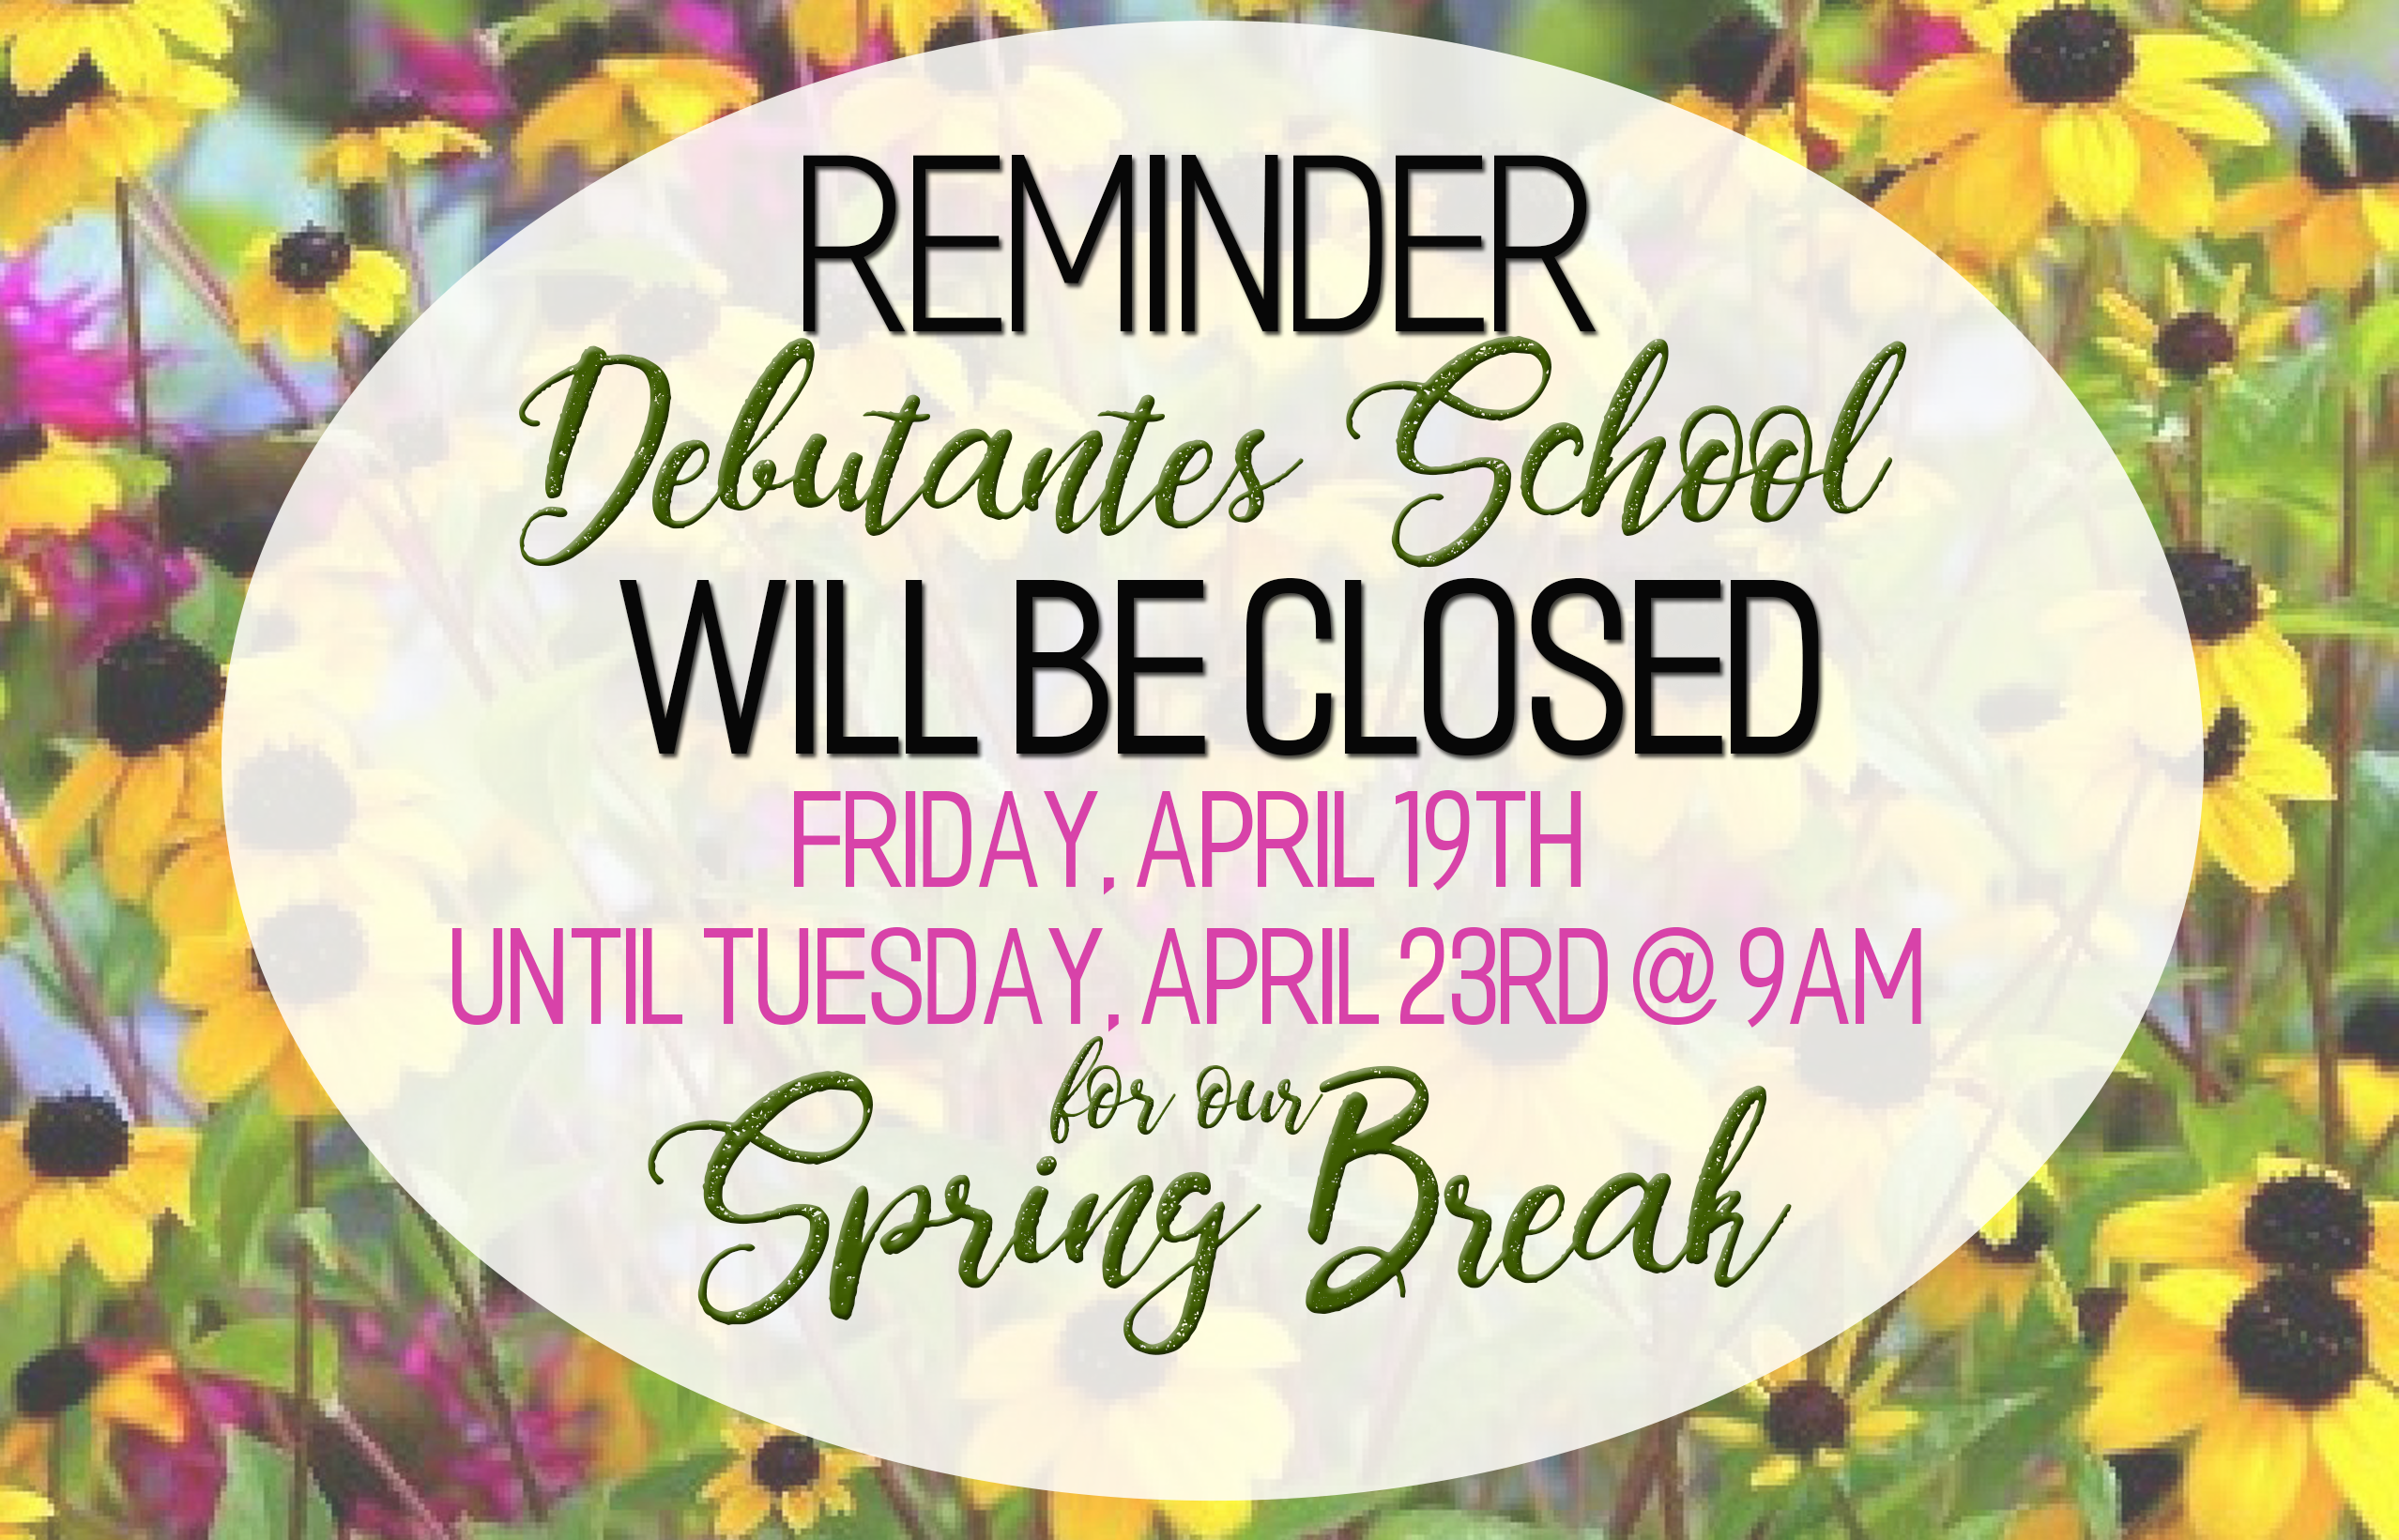 Debutantes School Spring Break 2019 – Debutantes School Intended For Spring Break For Nooristown School